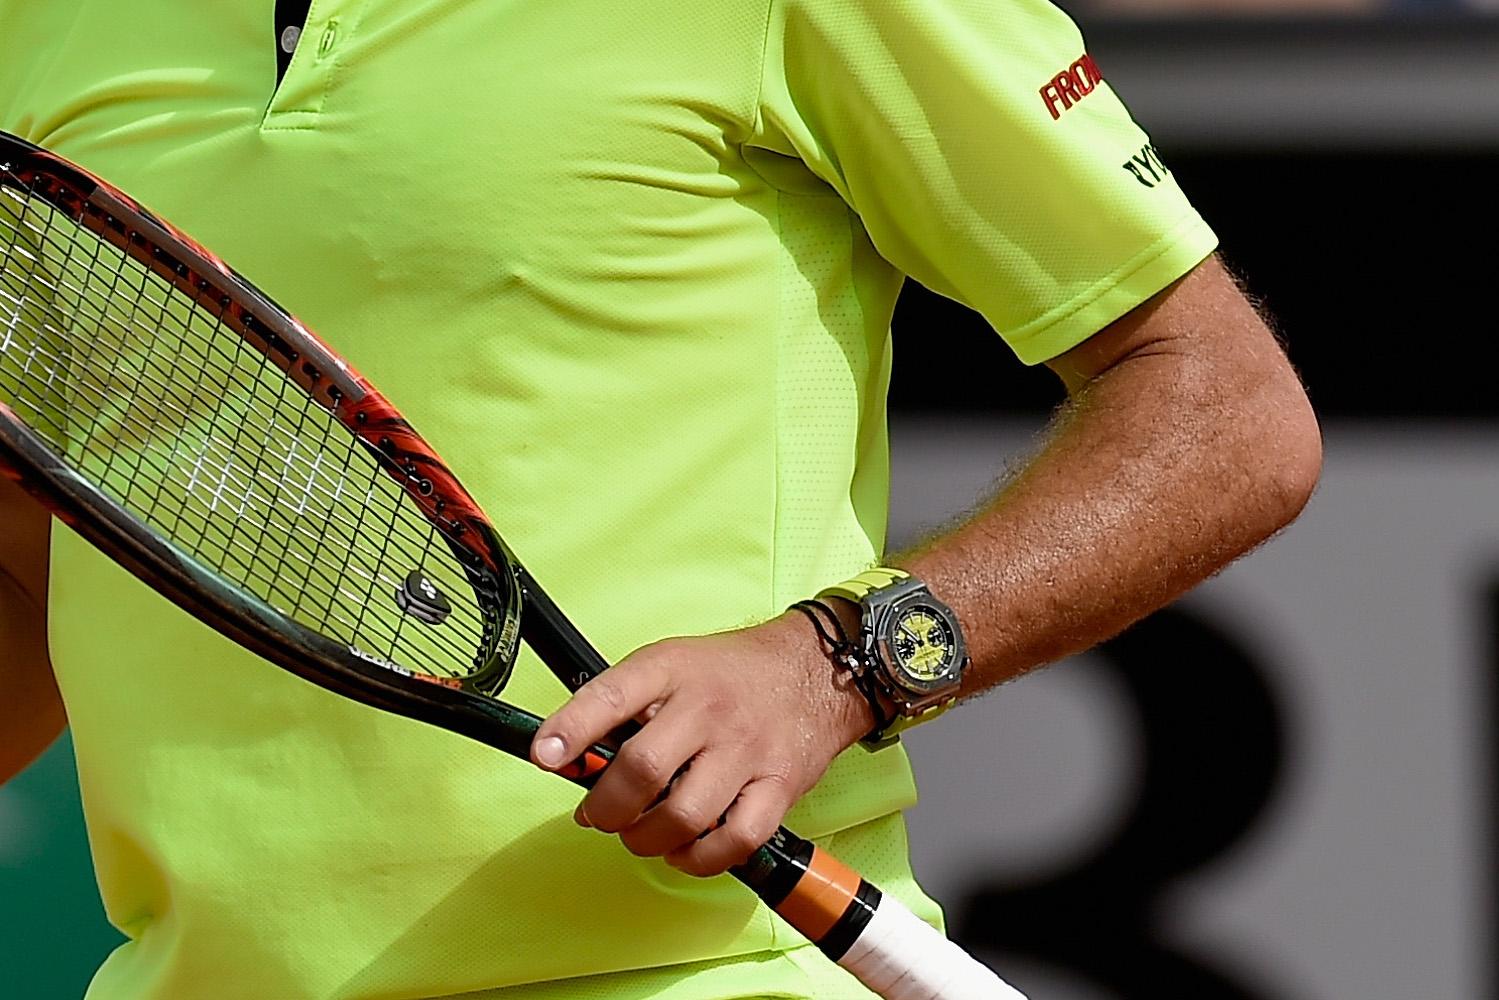 Stanislas Wawrinka wearing the new Audemars Piguet Royal Oak Offshore Diver Chronograph at Roland Garros 2016